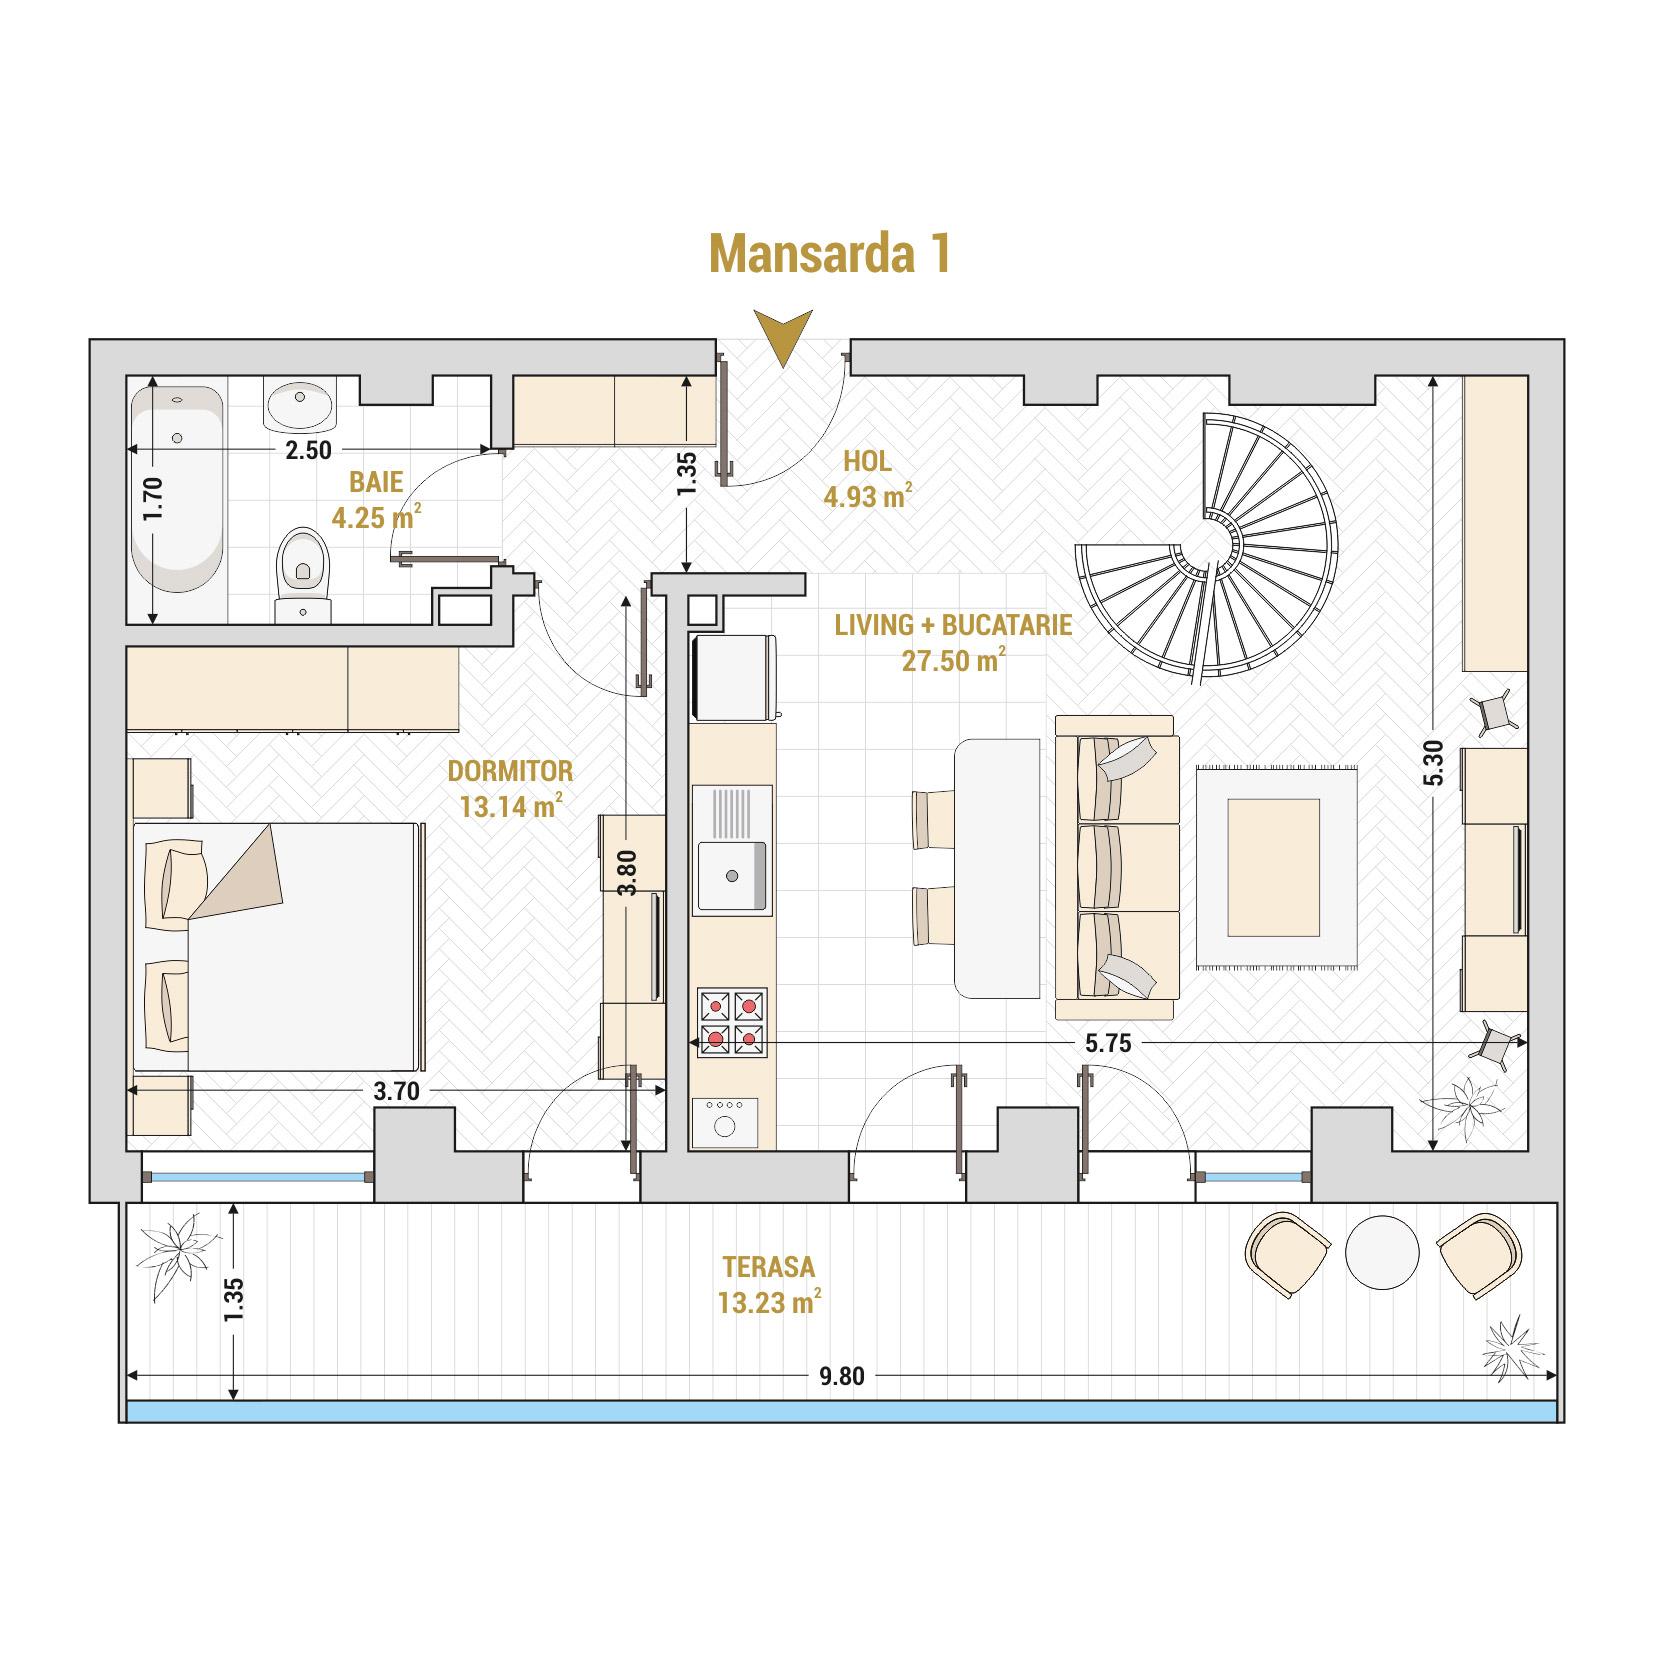 Duplex 3 camere de vanzare Bucuresti - Catedral Residence - Marriott, Piata Unirii, 13 Septembrie, Izvor - T2 - A